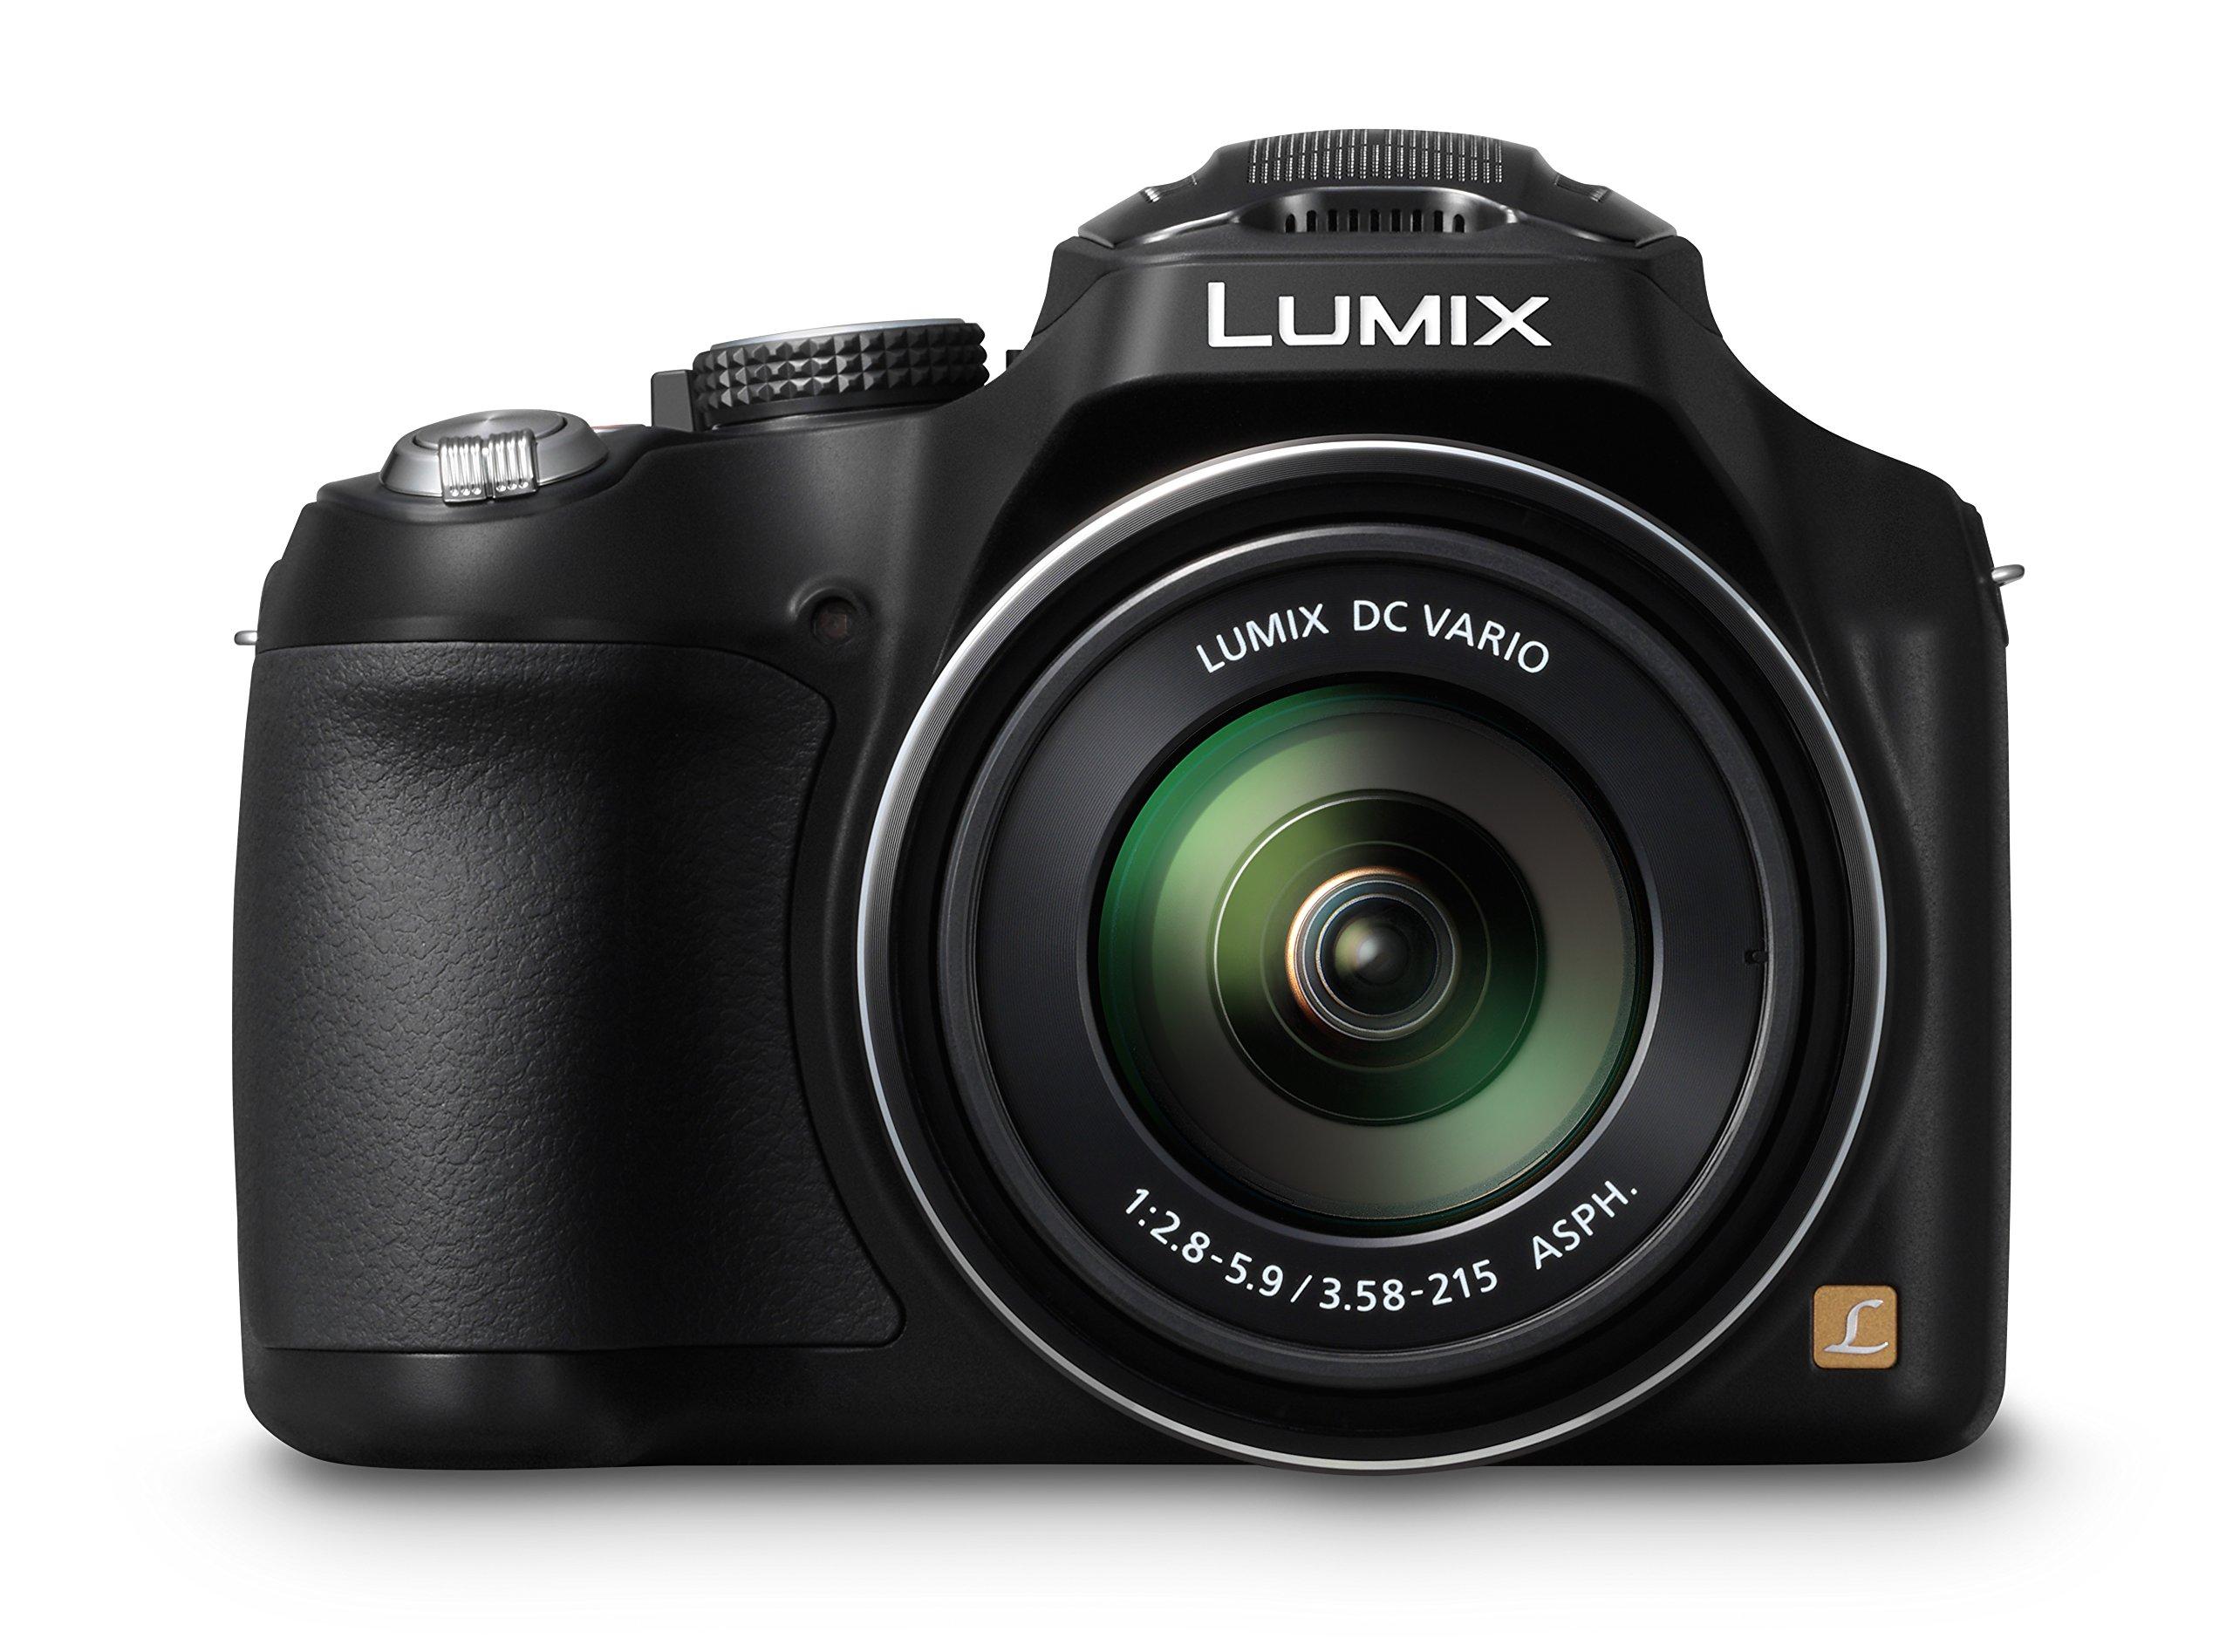 Panasonic Lumix DMC-FZ72 Fotocamera Digitale, Sensore MOS 1/2,3 High Sensivity, 16,1 Megapixel effettivi product image